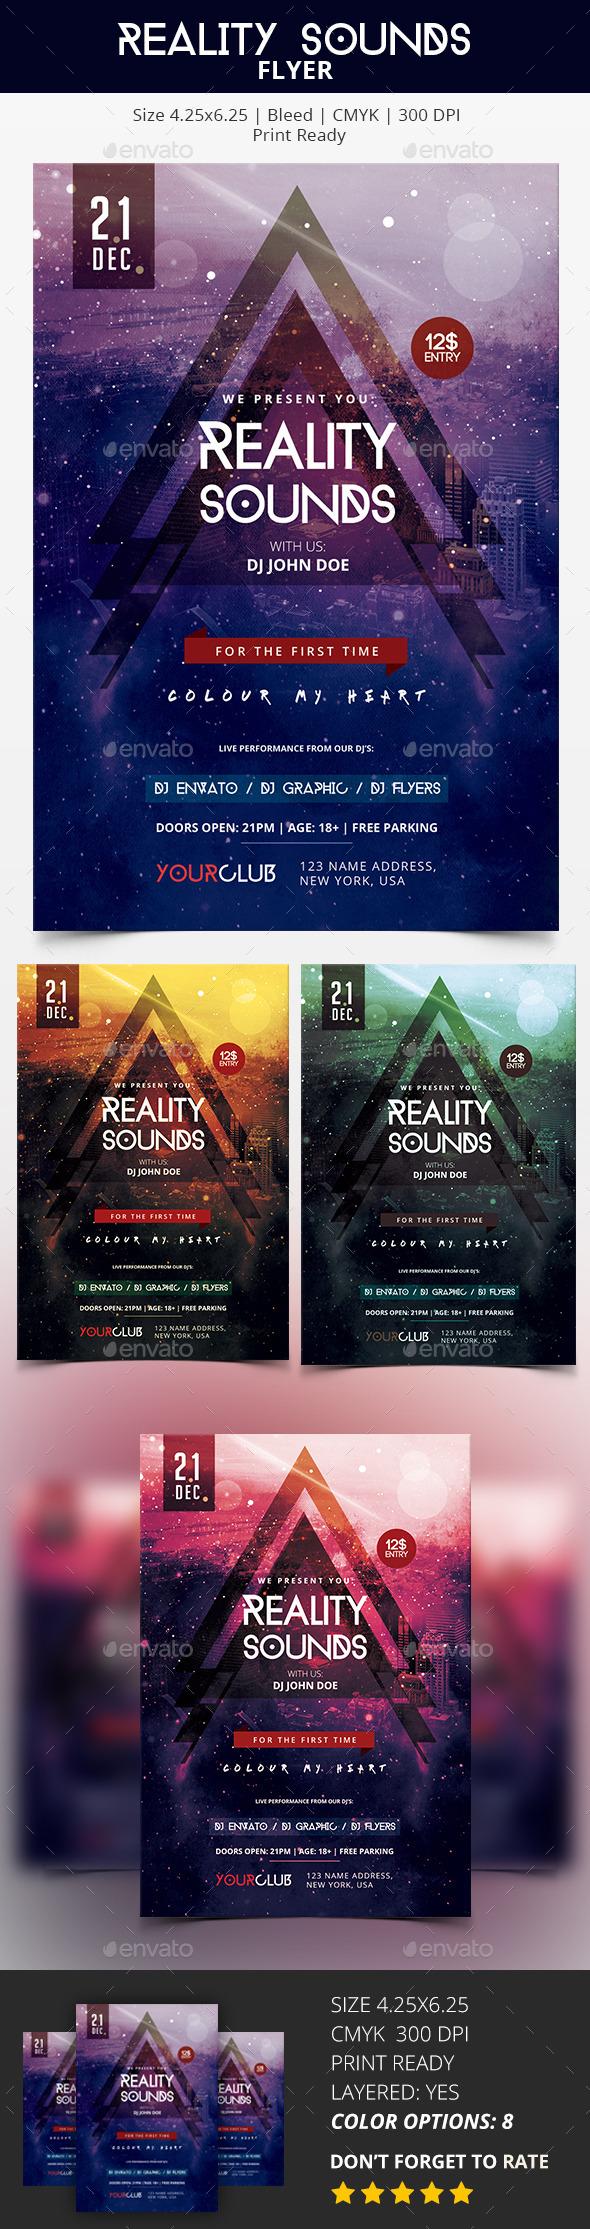 Reality Sounds - PSD Flyer - Flyers Print Templates